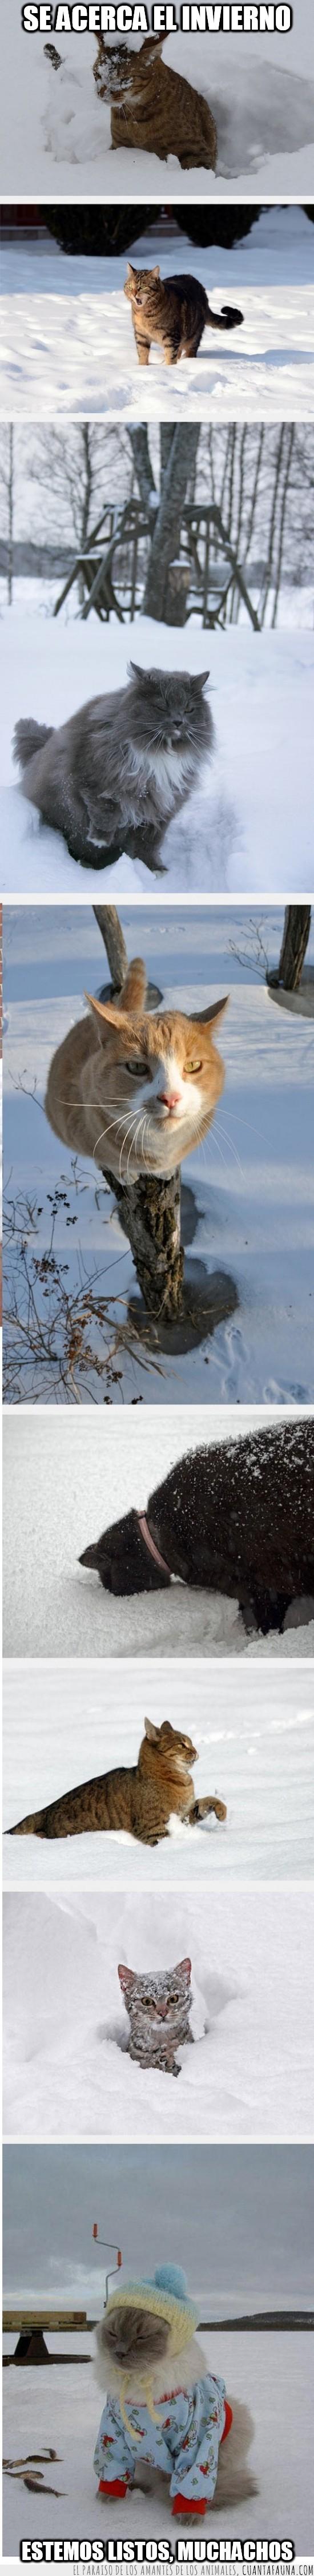 gato,graciosos,invierno,nieve,ropa